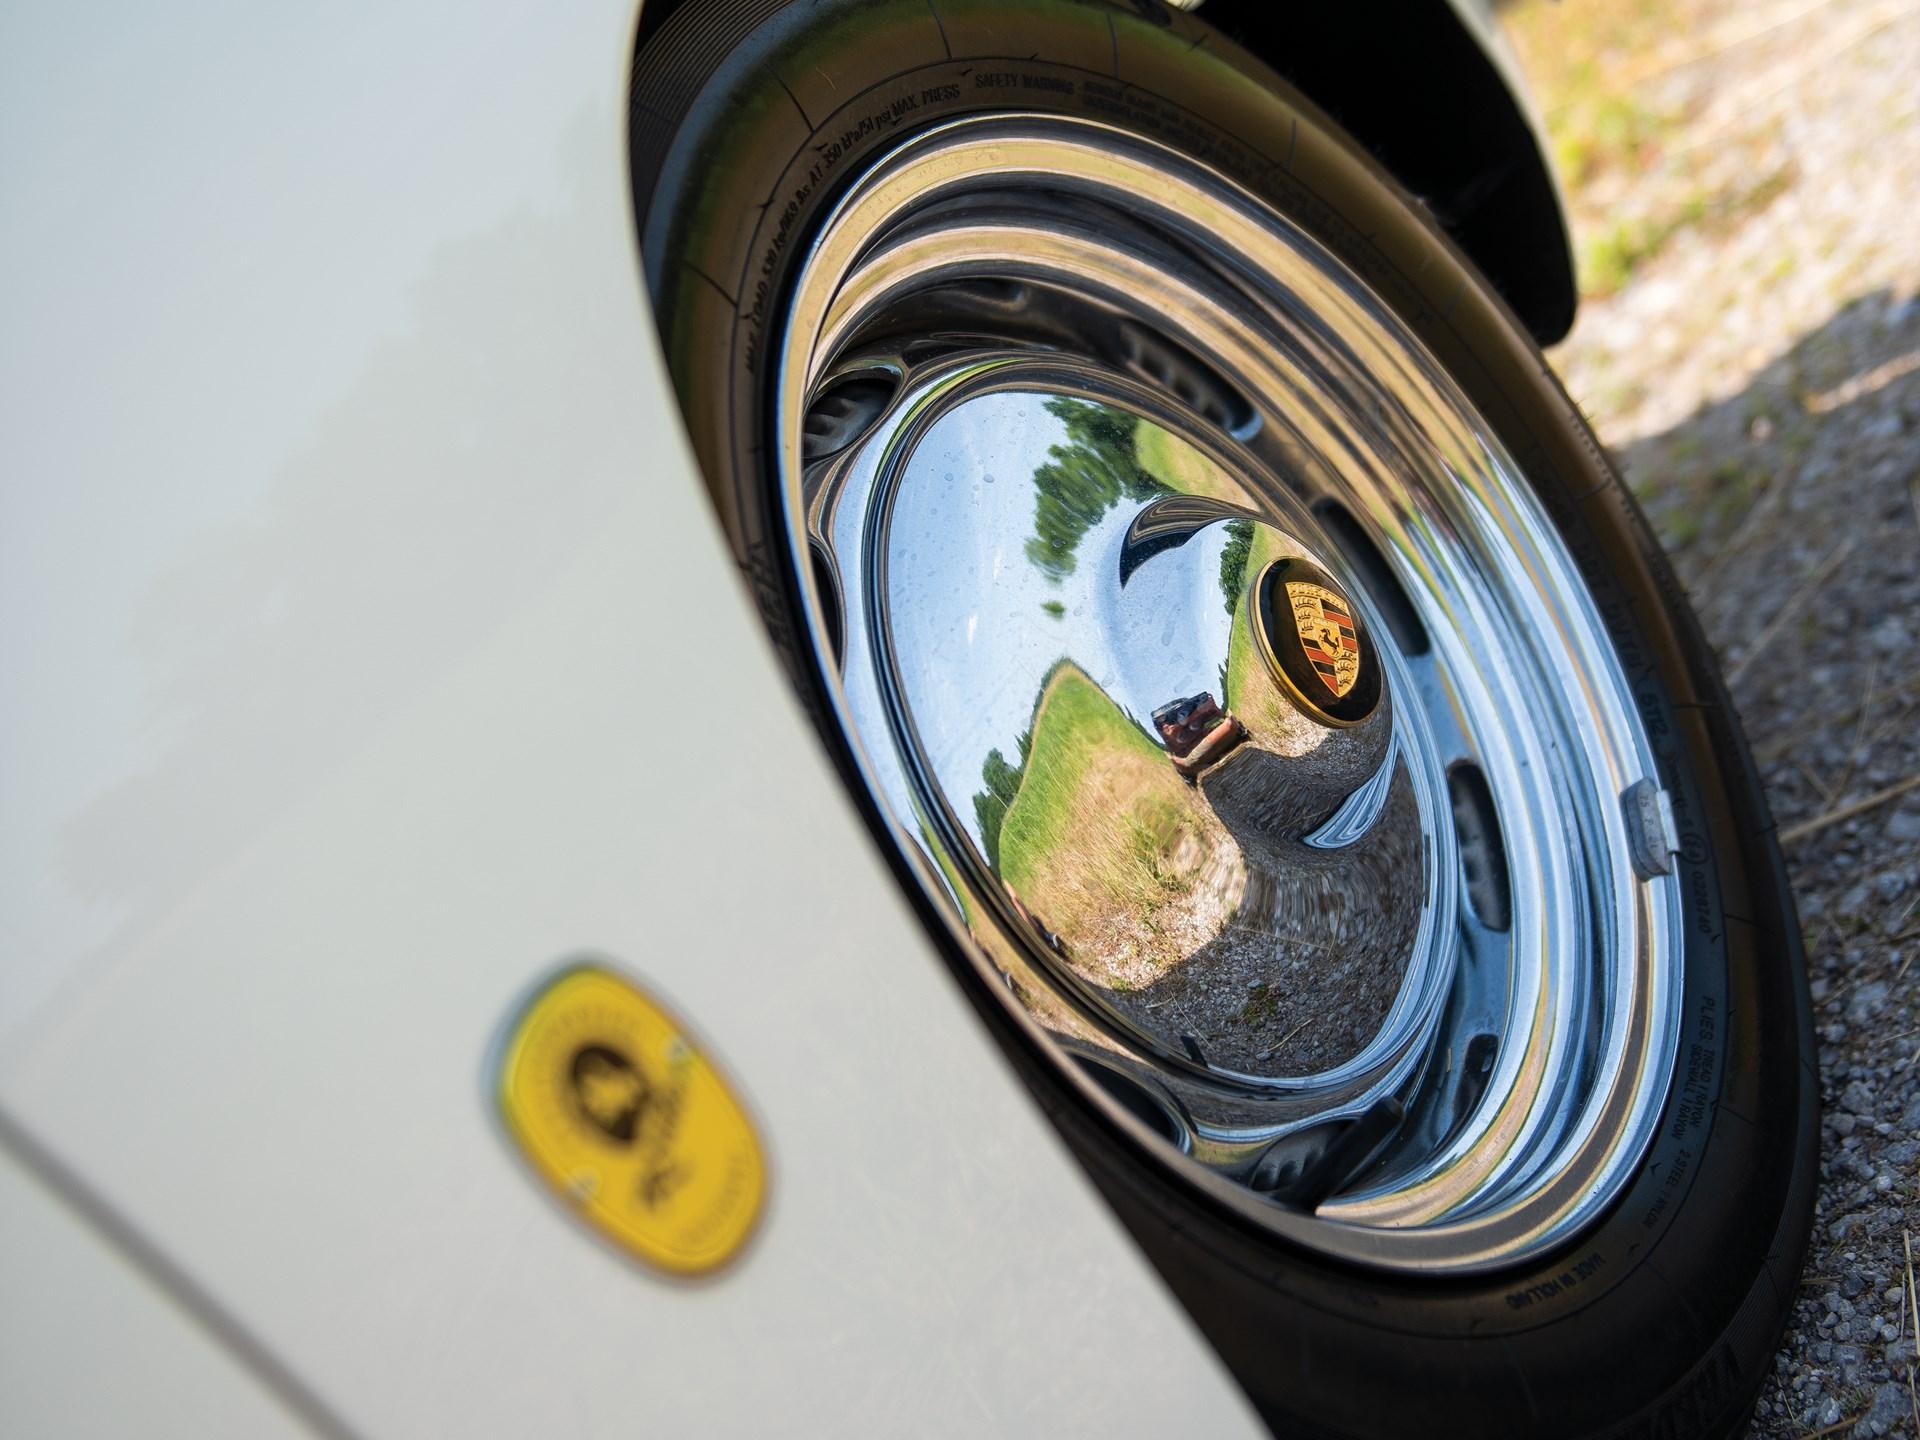 1960 Porsche 356 B Super 90 Cabriolet by Reutter